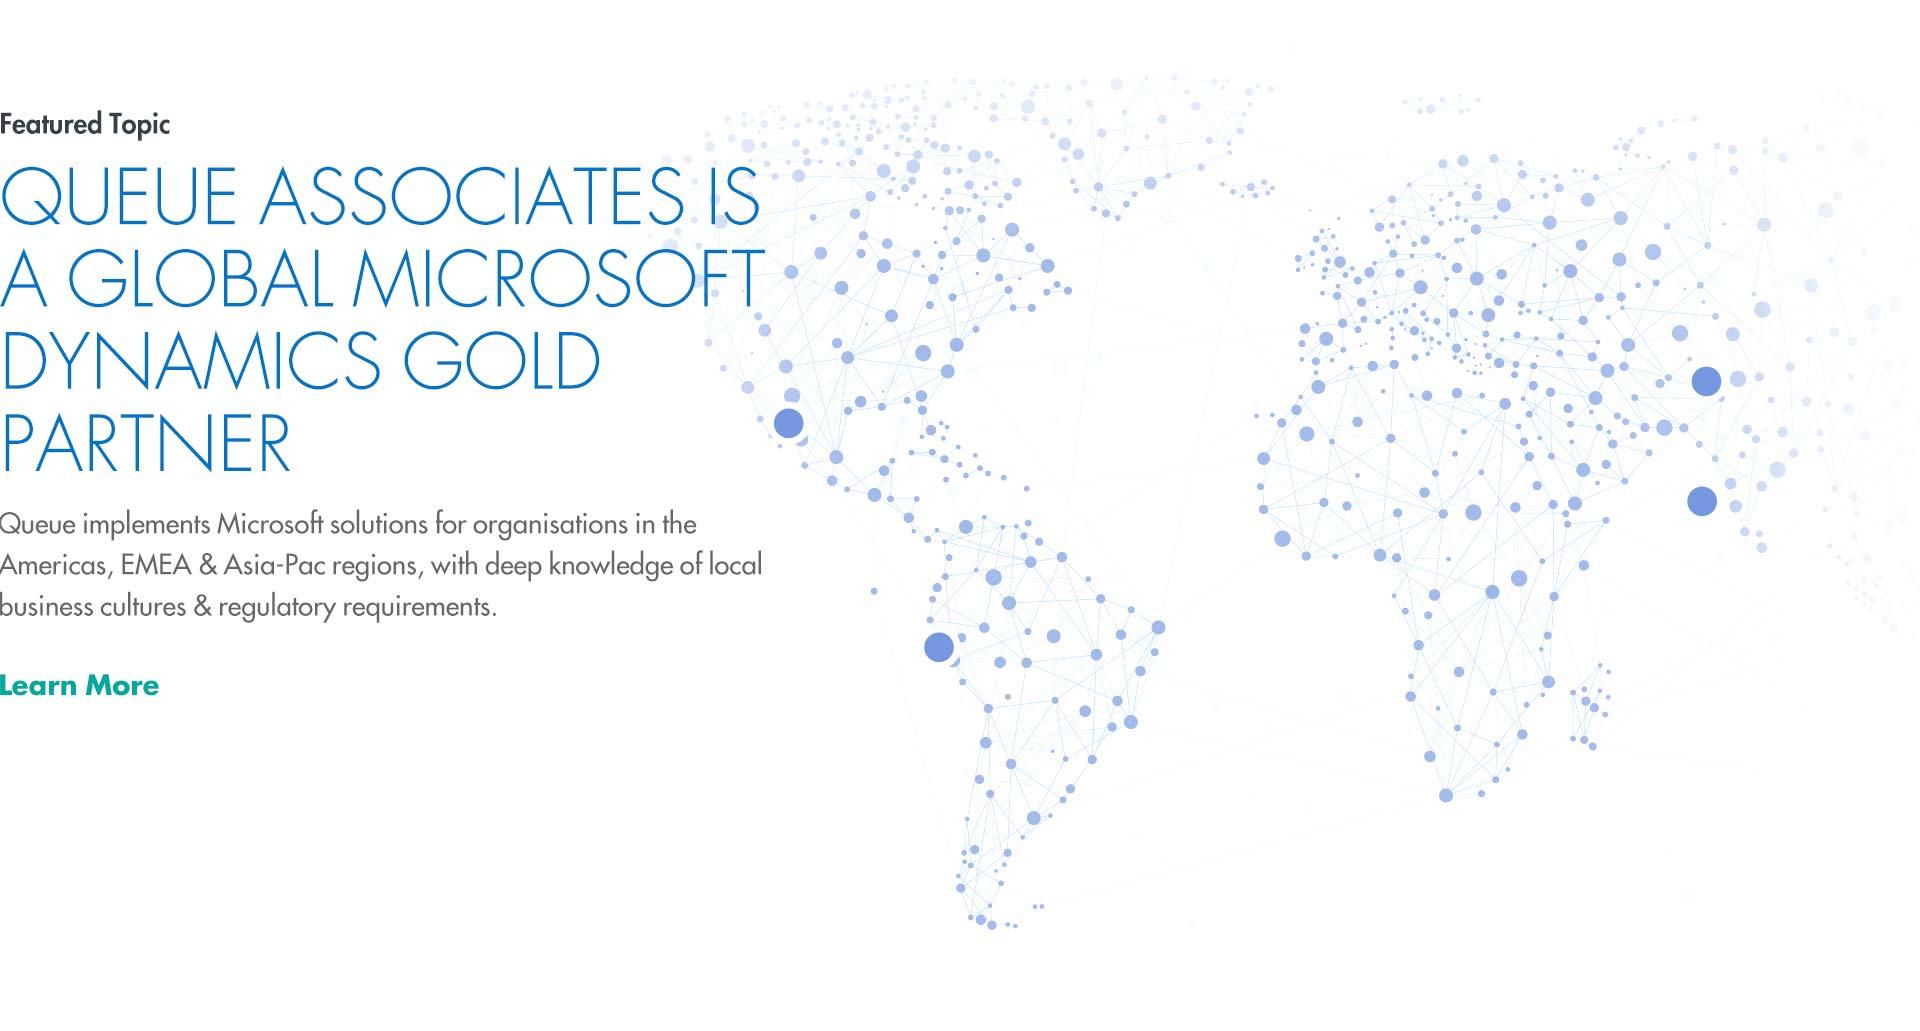 Microsoft dynamics gold partner microsoft gold partner erp follow queue associates on twitter xflitez Images